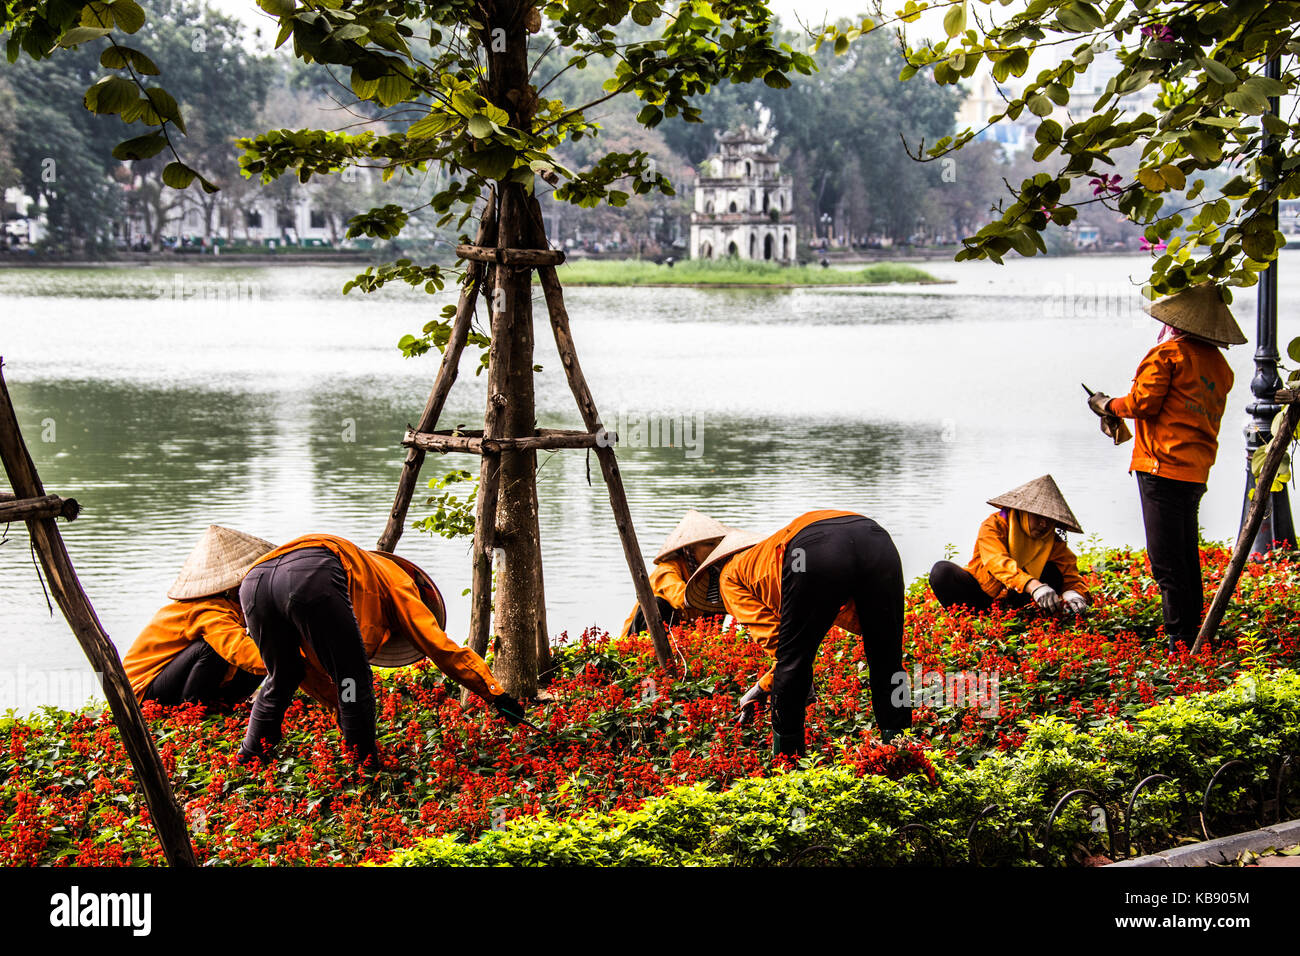 Women tending flowers in front of Thap Rua temple or Turtle Tower, Hoan Kiem lake, Hanoi, Vietnam - Stock Image